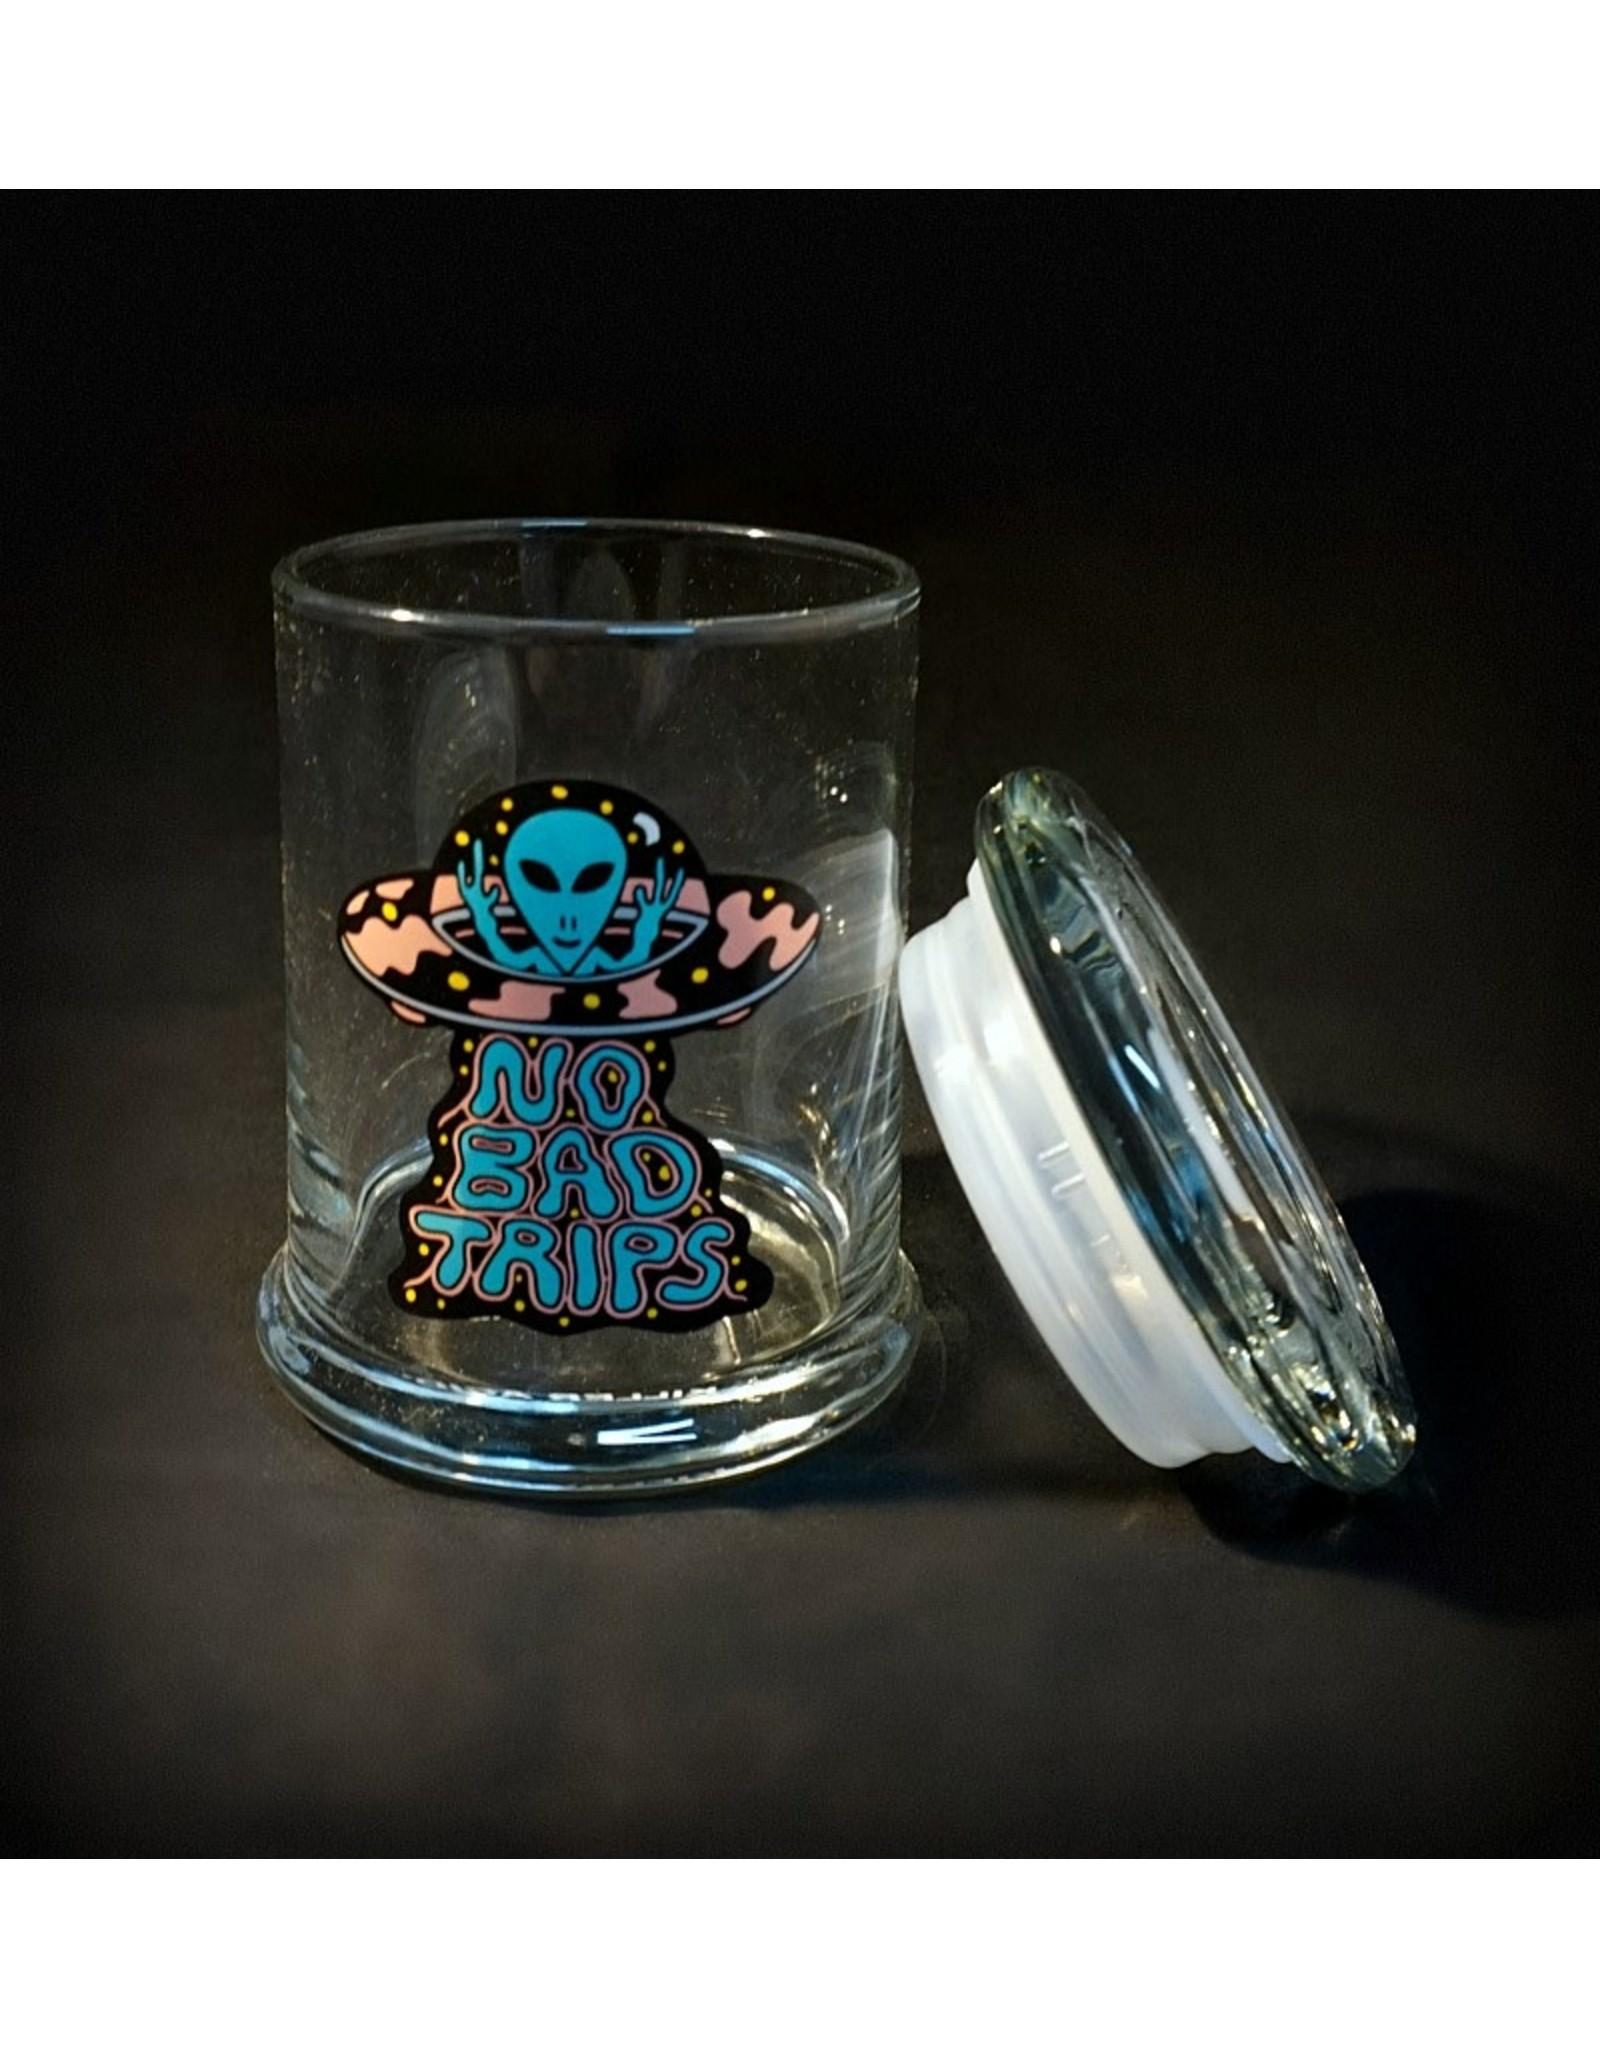 420 Science 420 Science Jars Medium No Bad Trips Pop Top